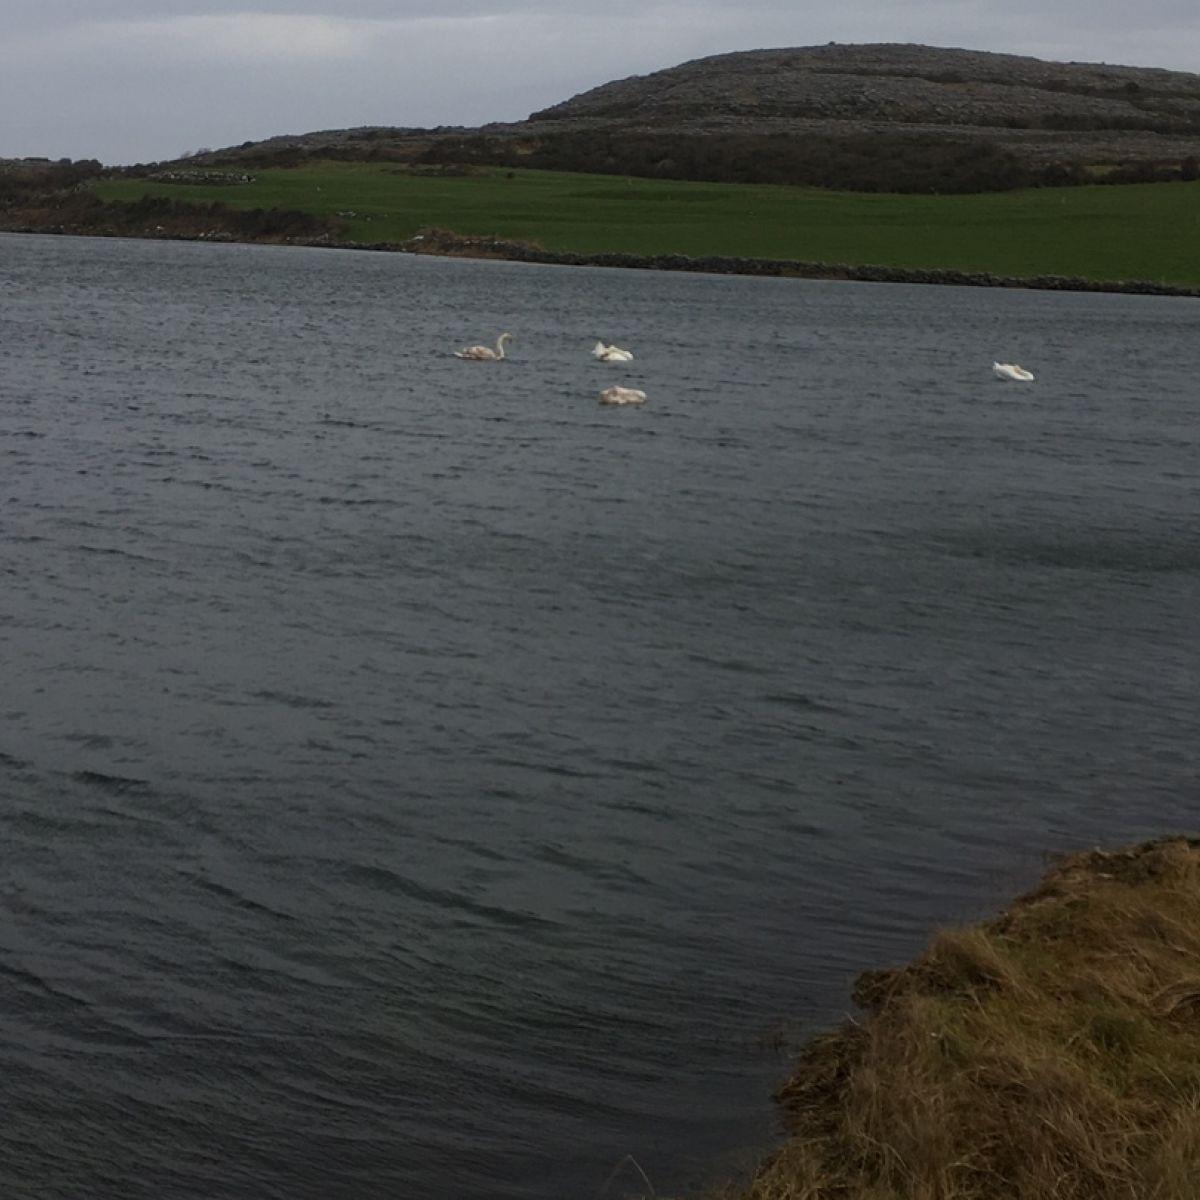 Ennis Weather - Met ireann Forecast for Ennis, Ireland - The